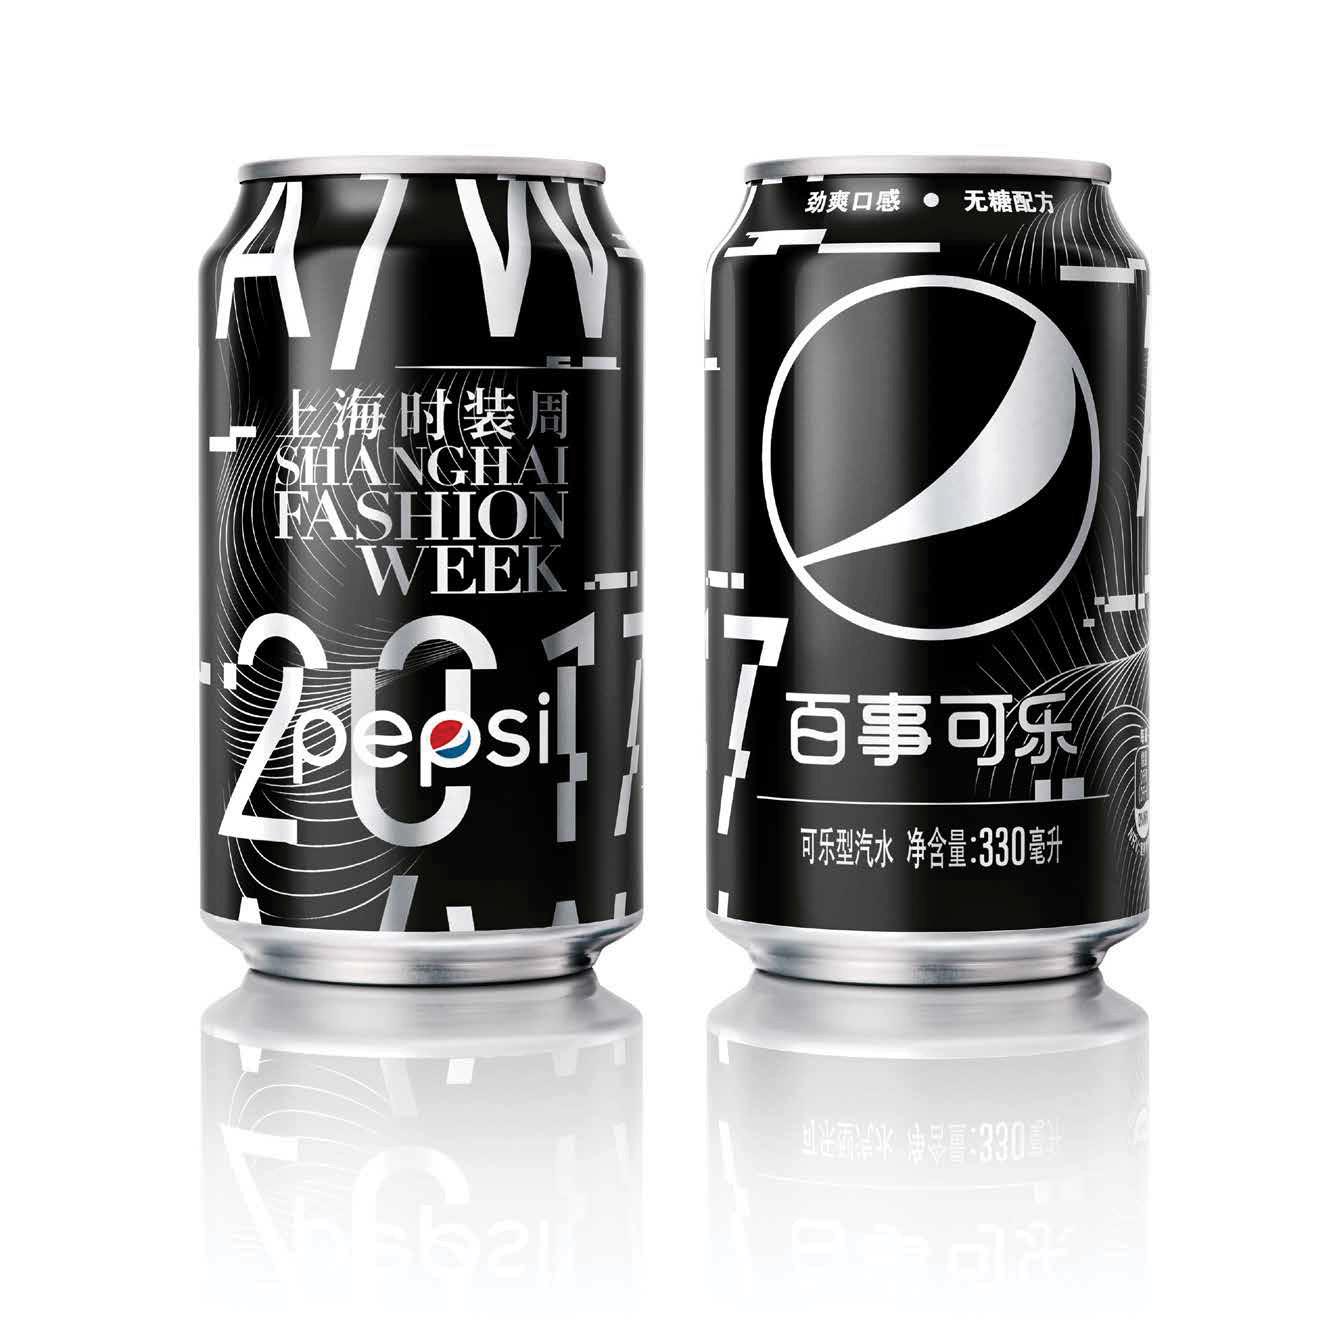 Pepsi Image 5